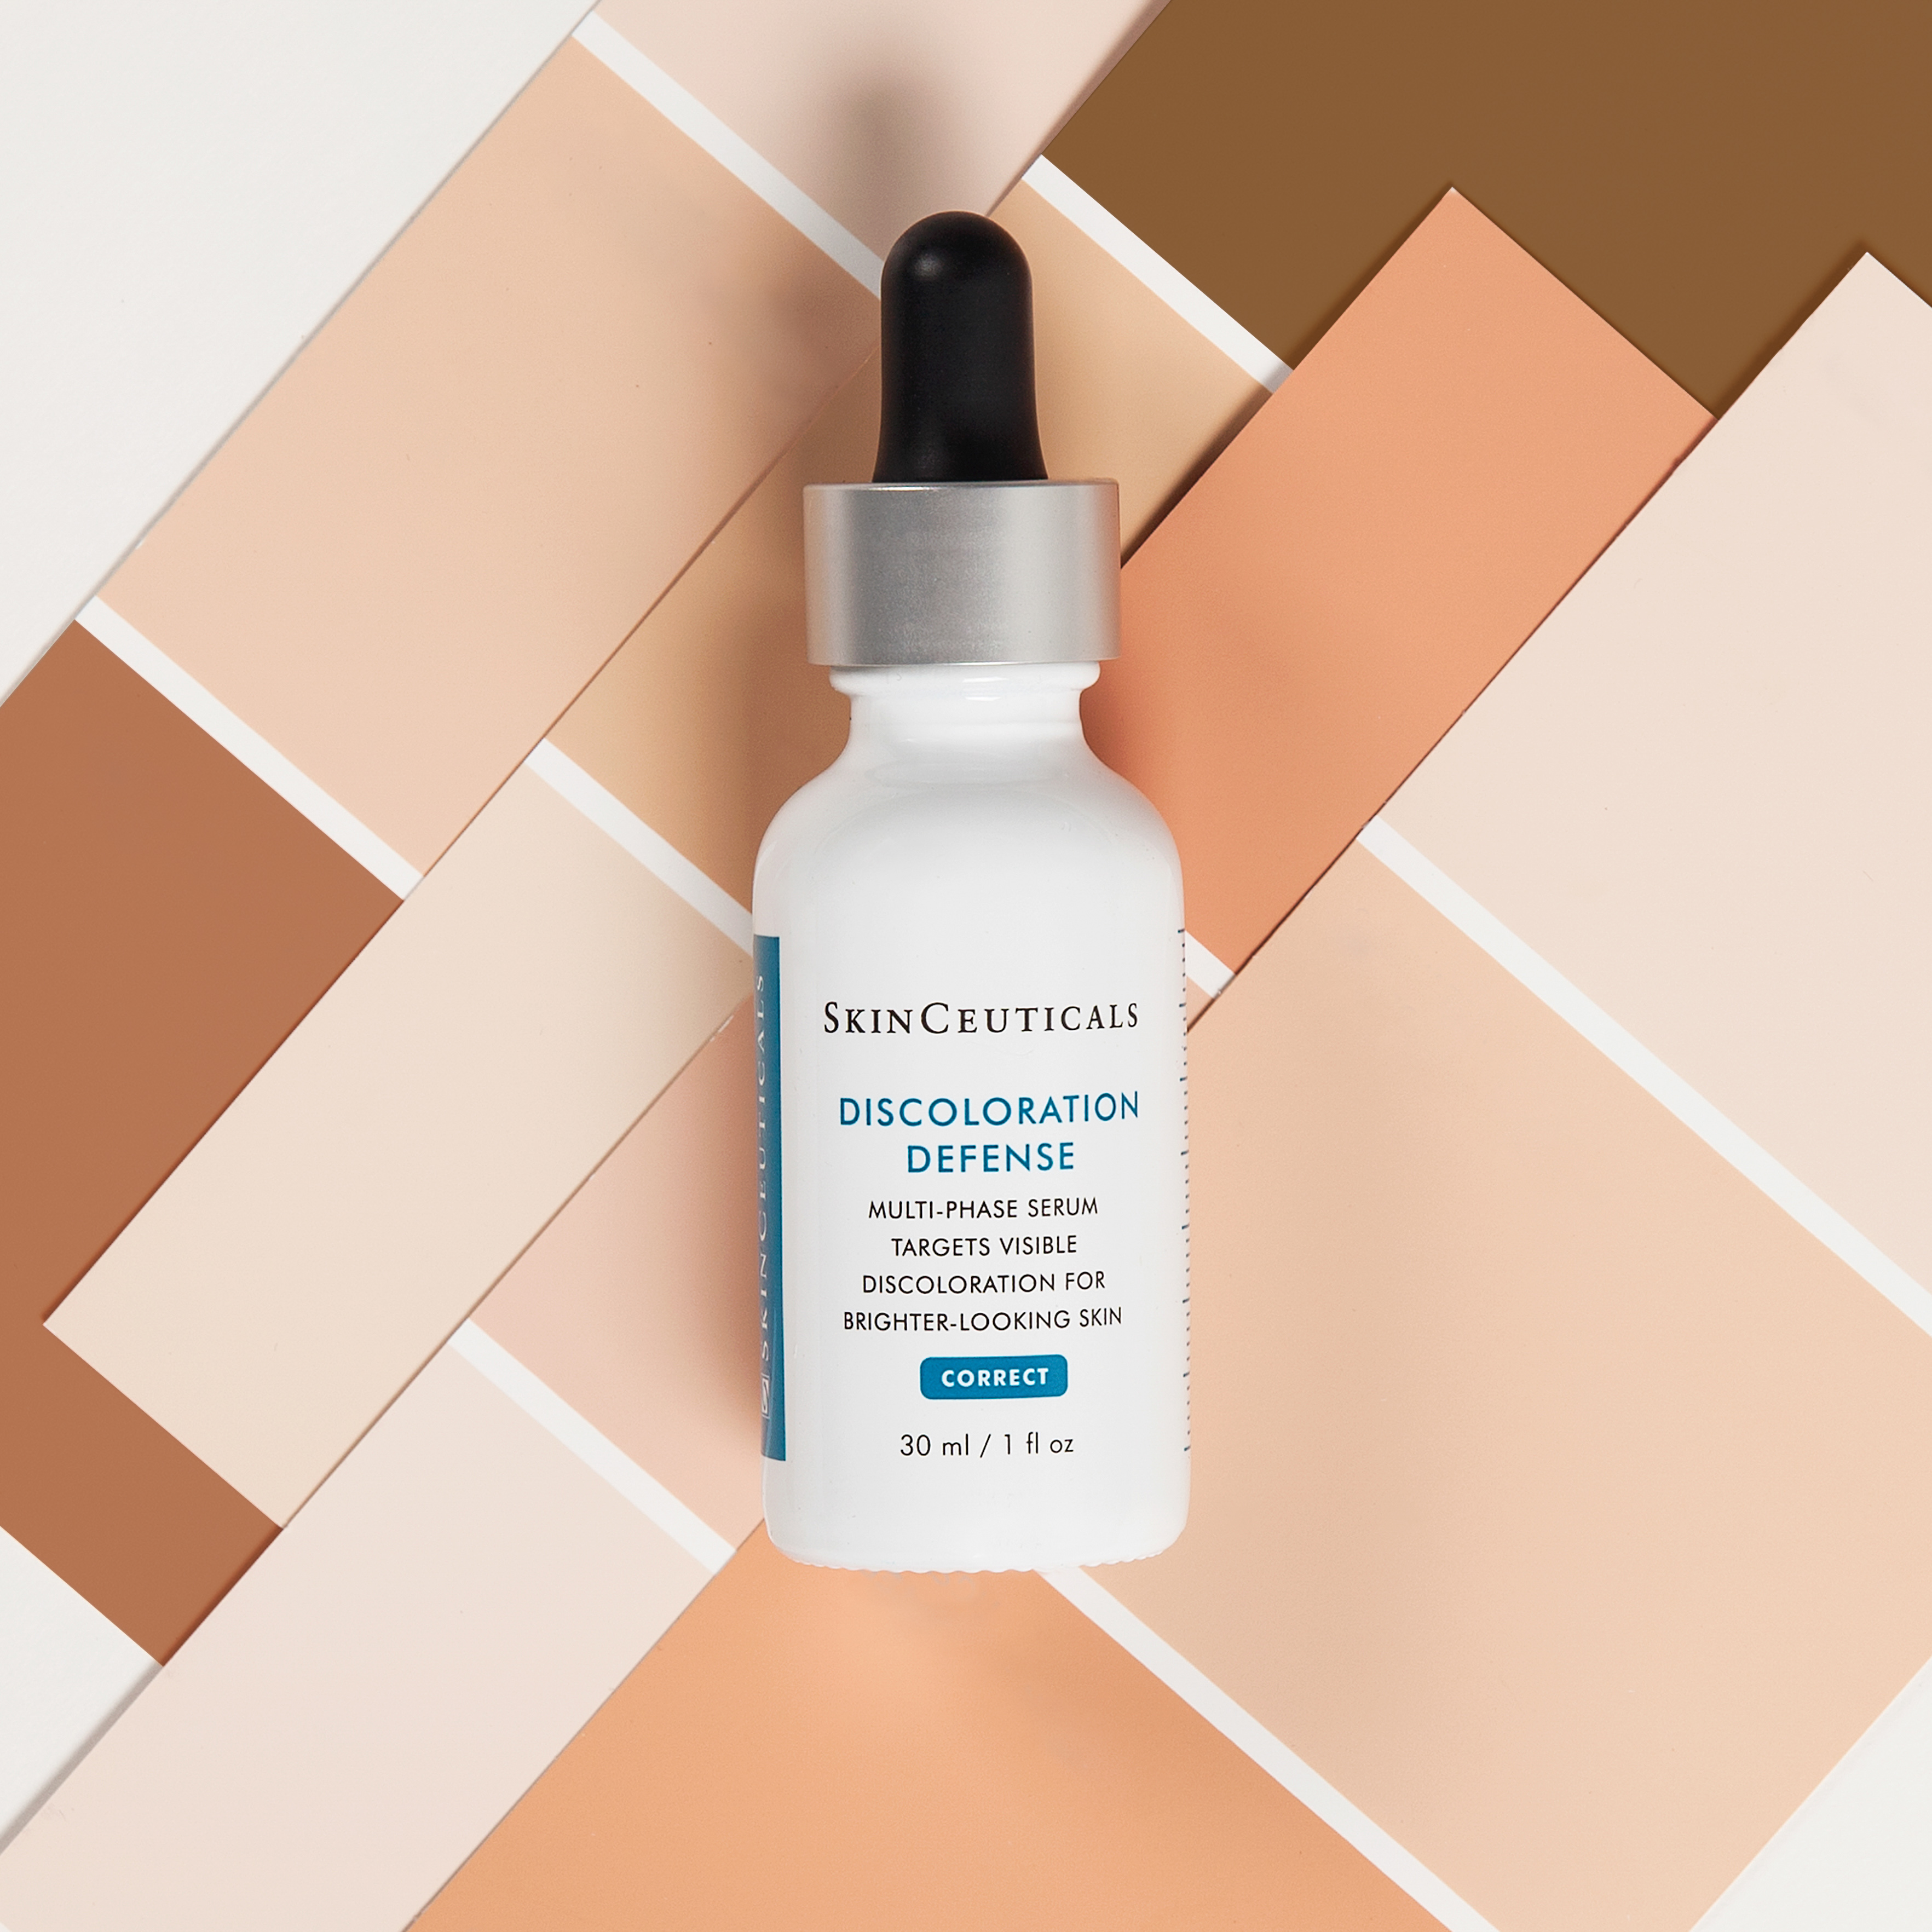 Skinceuticals Discoloration Defense: Armor Against Hyperpigmentation